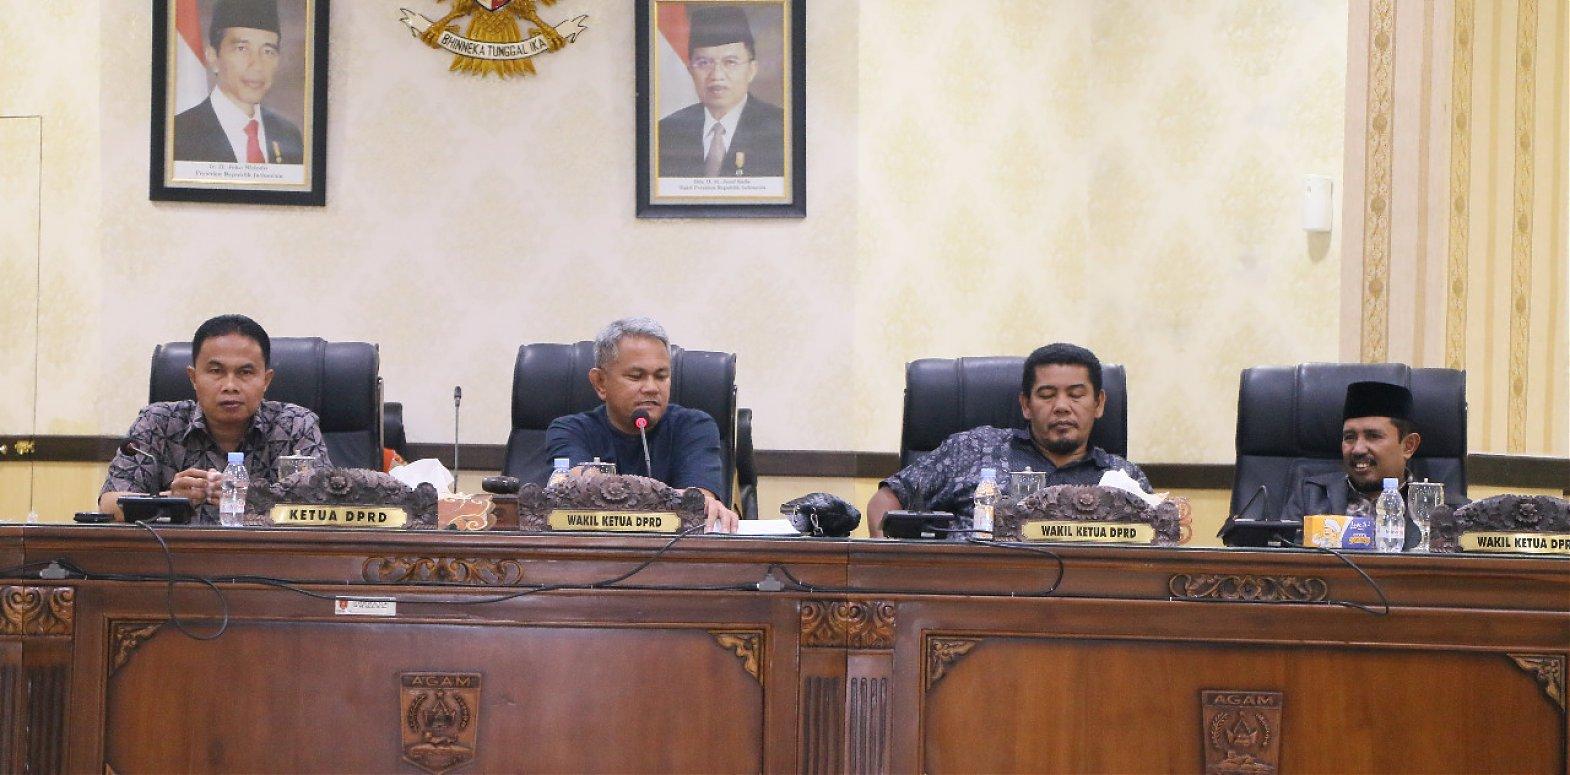 Komisi I Dprd Agam dalam rapat Paripurna internal